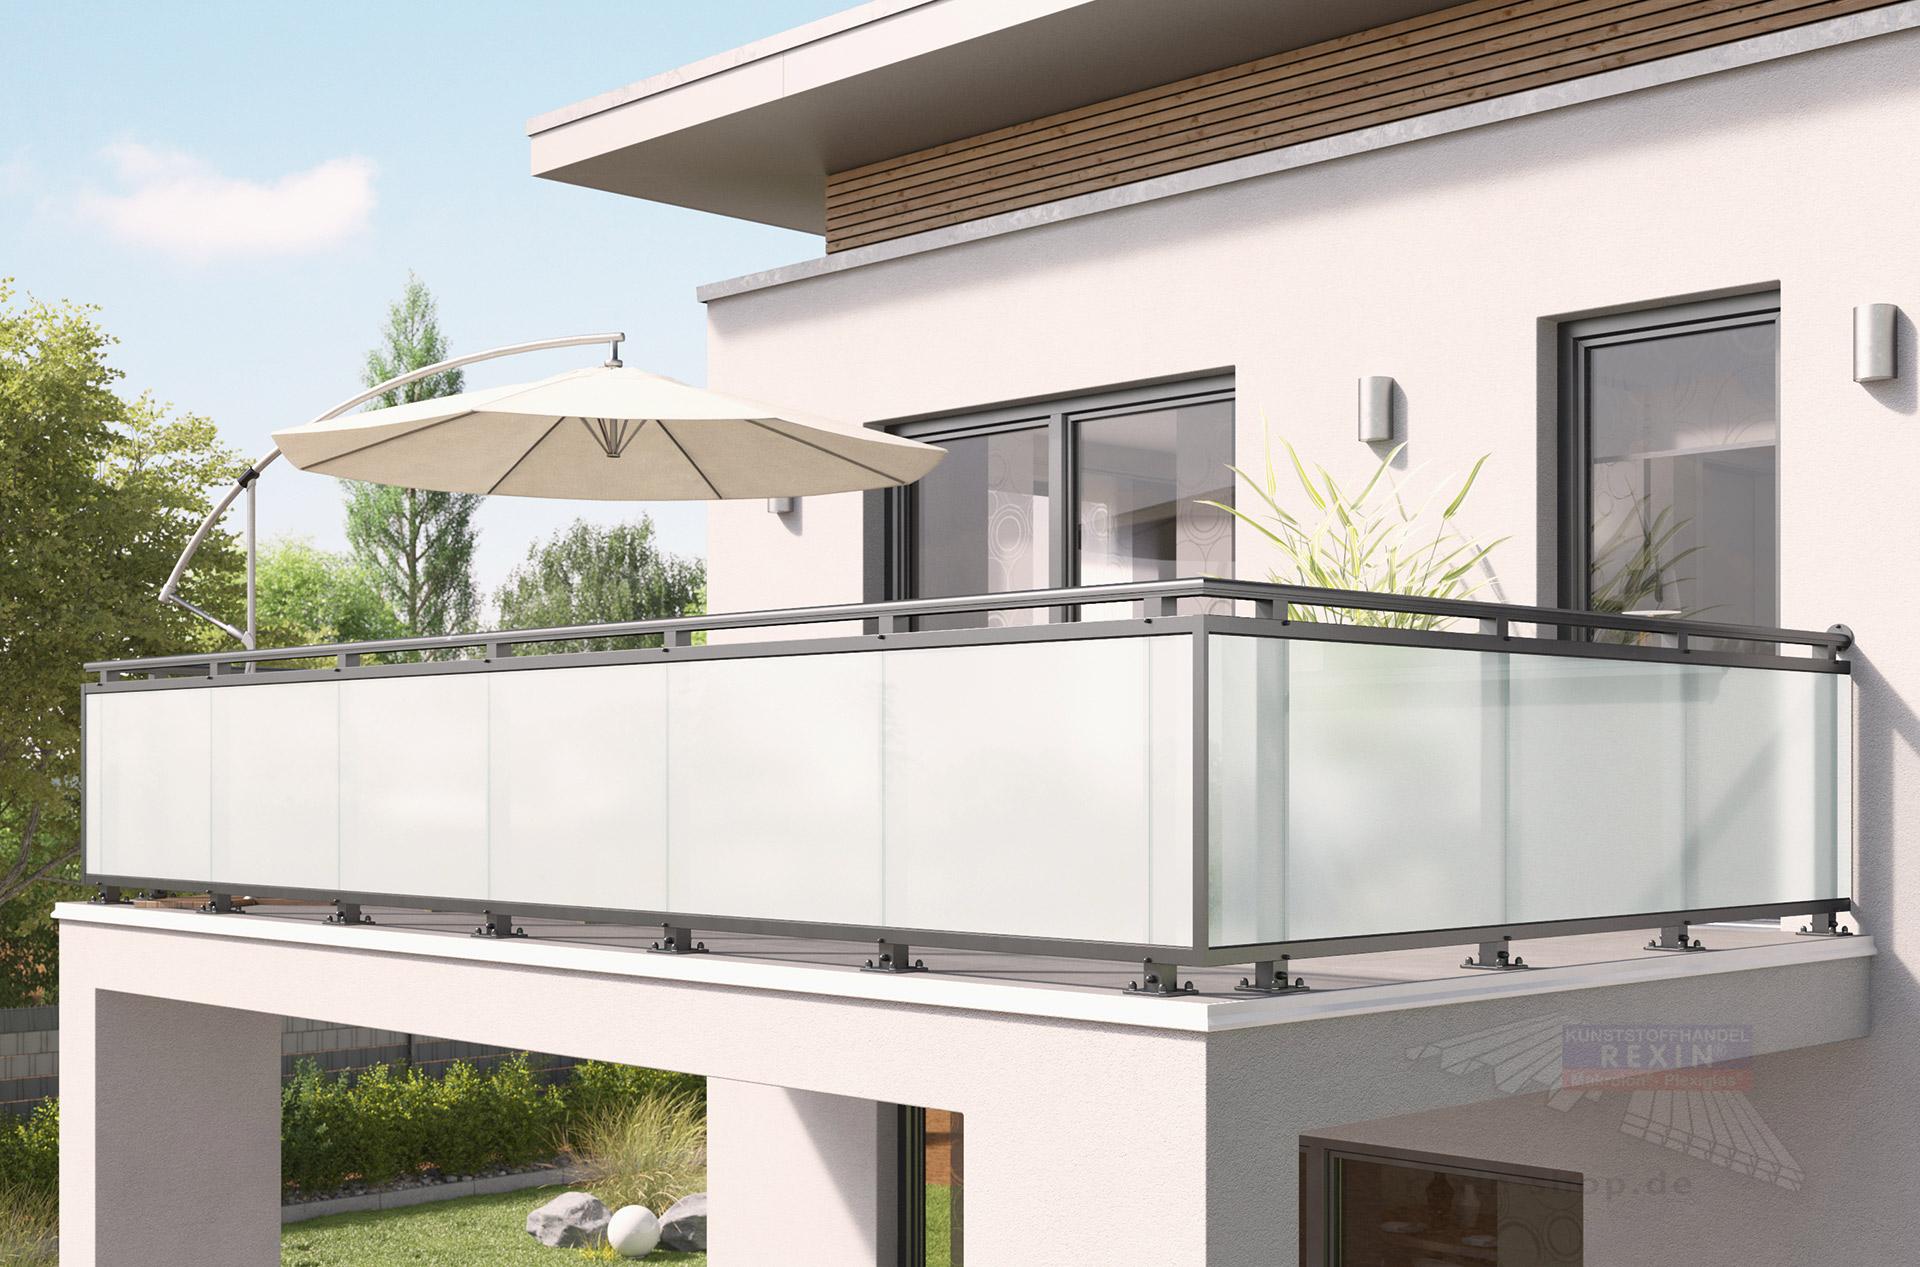 Rexoguard Balkongelander Fullung 4m Mit Vsg Glas Rexin Shop